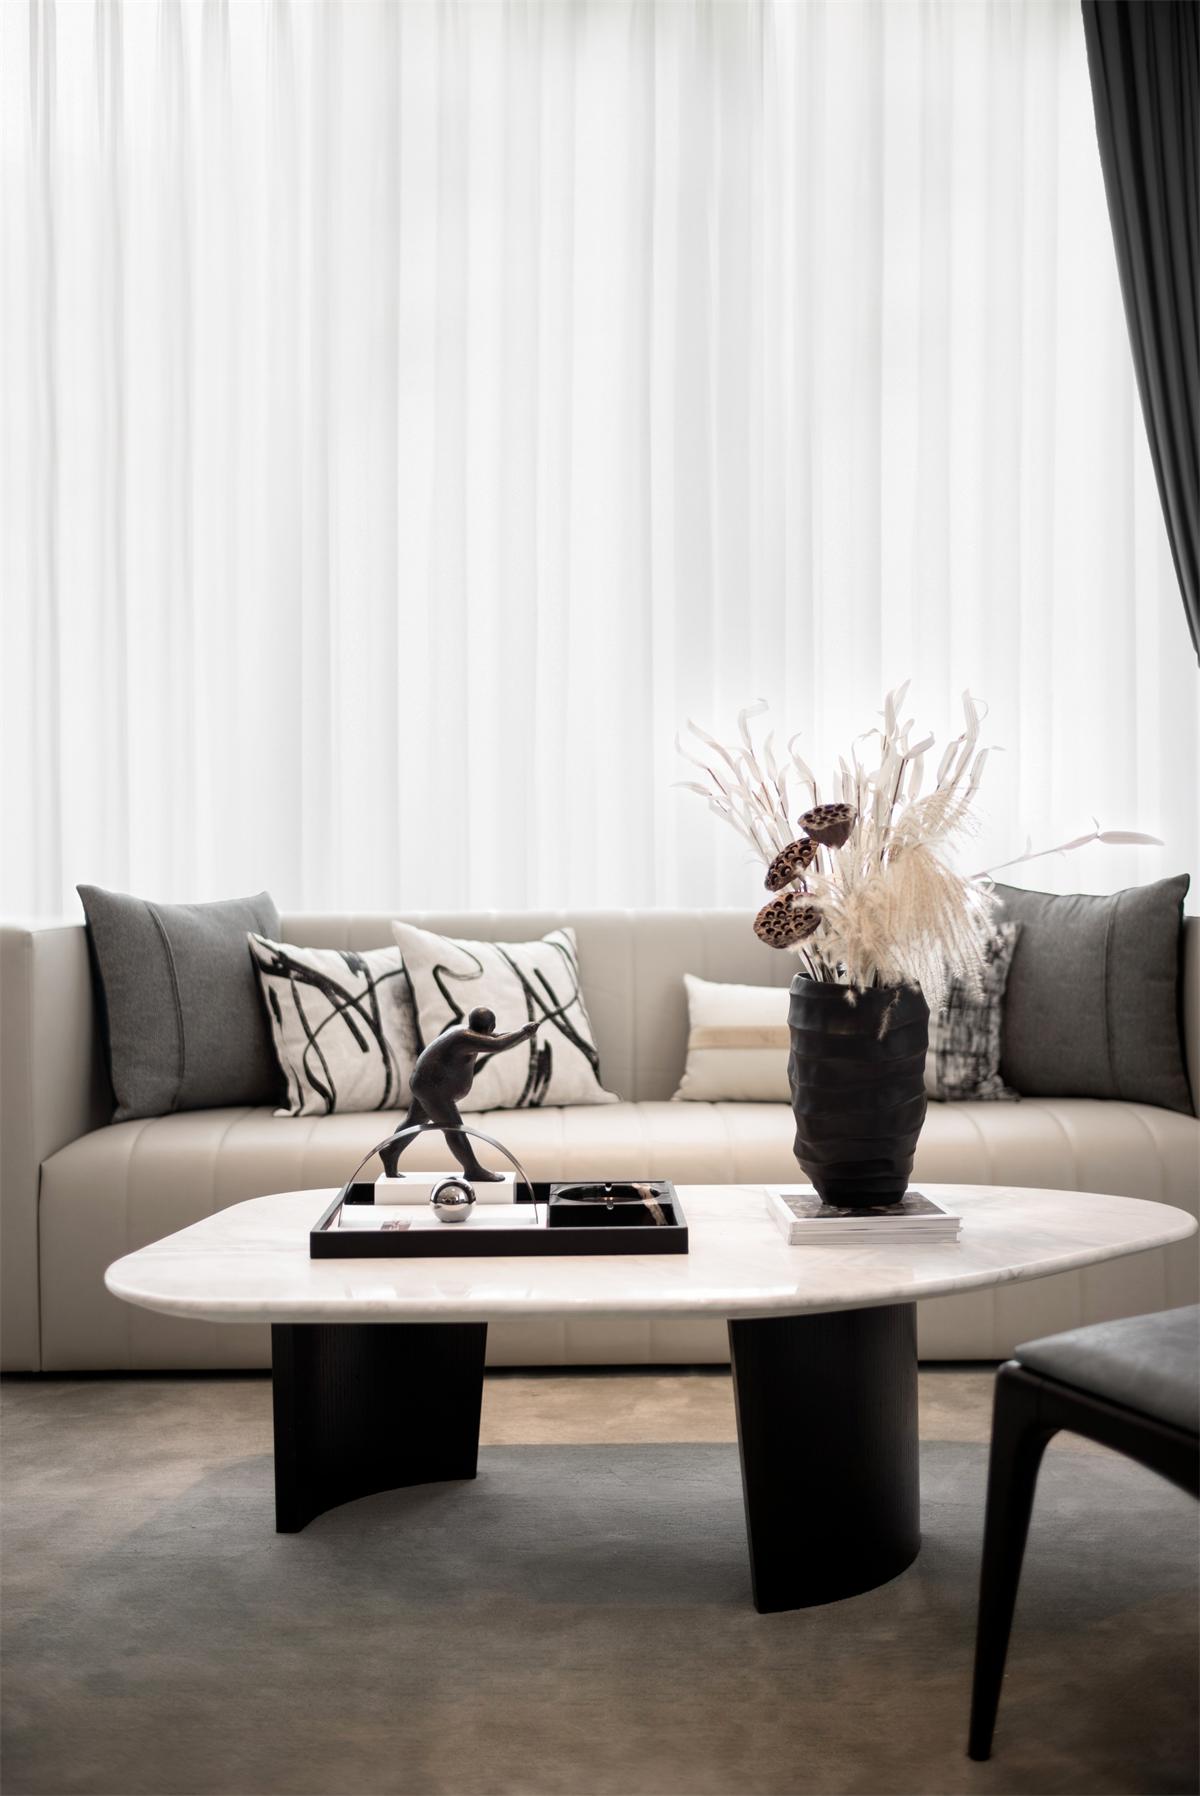 几朵设计丨东方语境的现代生活 living spaces home decor home